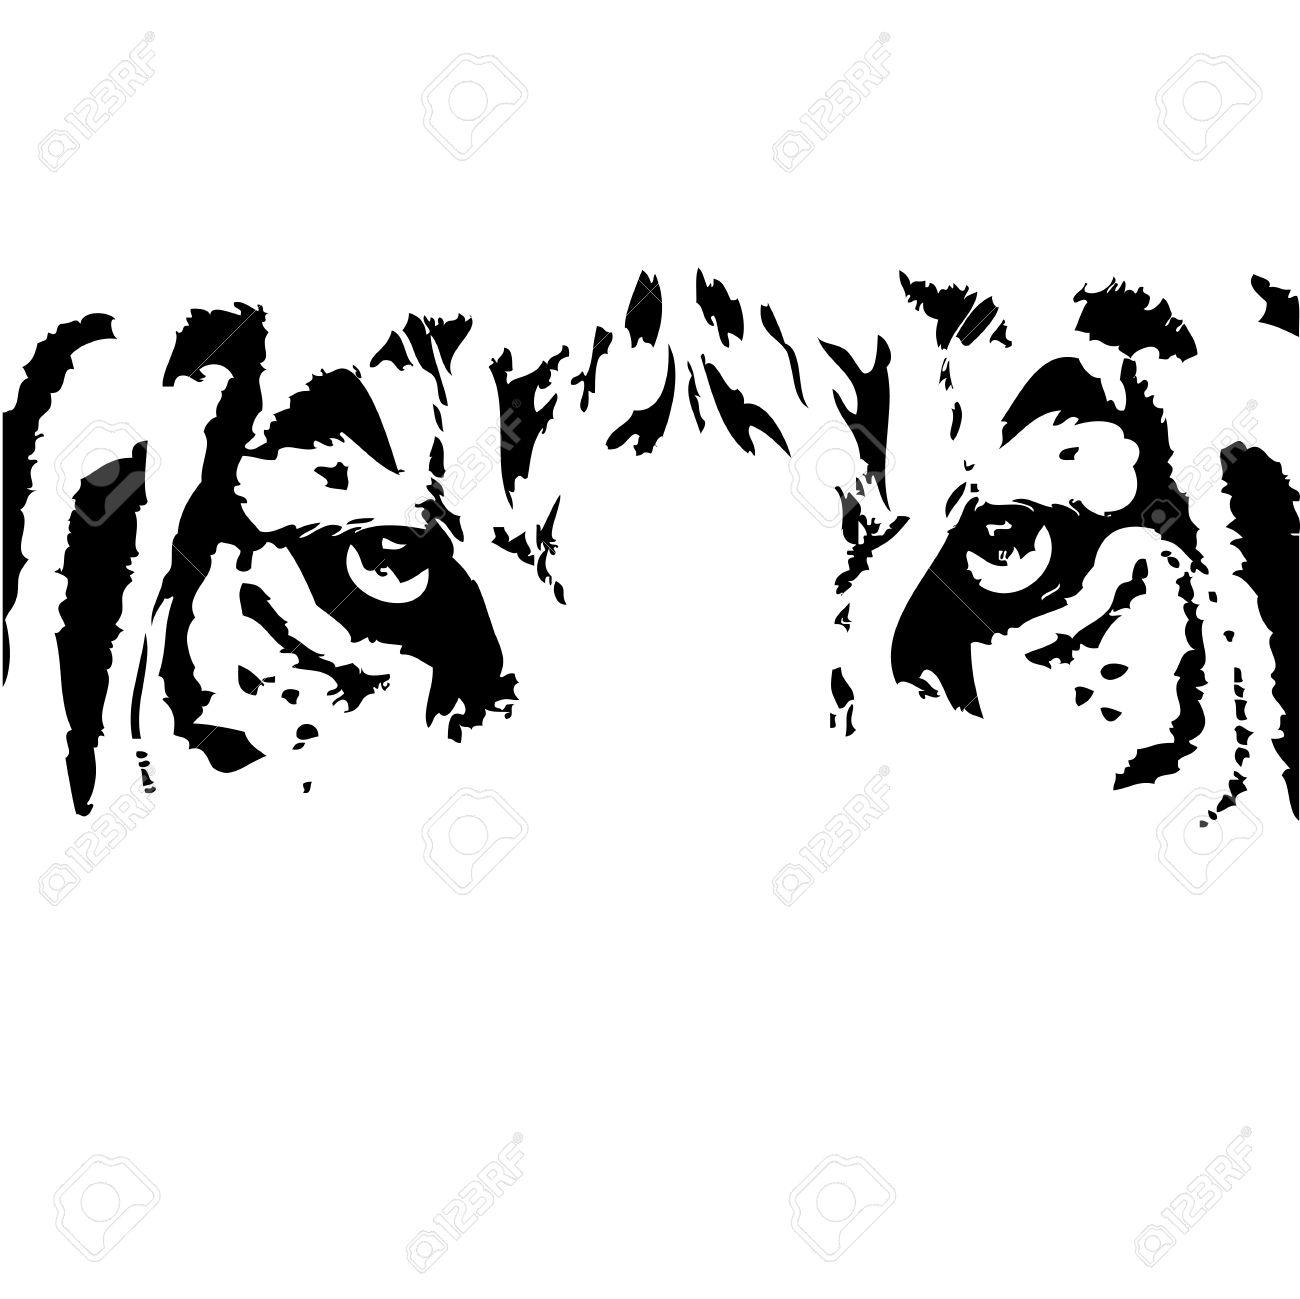 Eyes clip art black and white